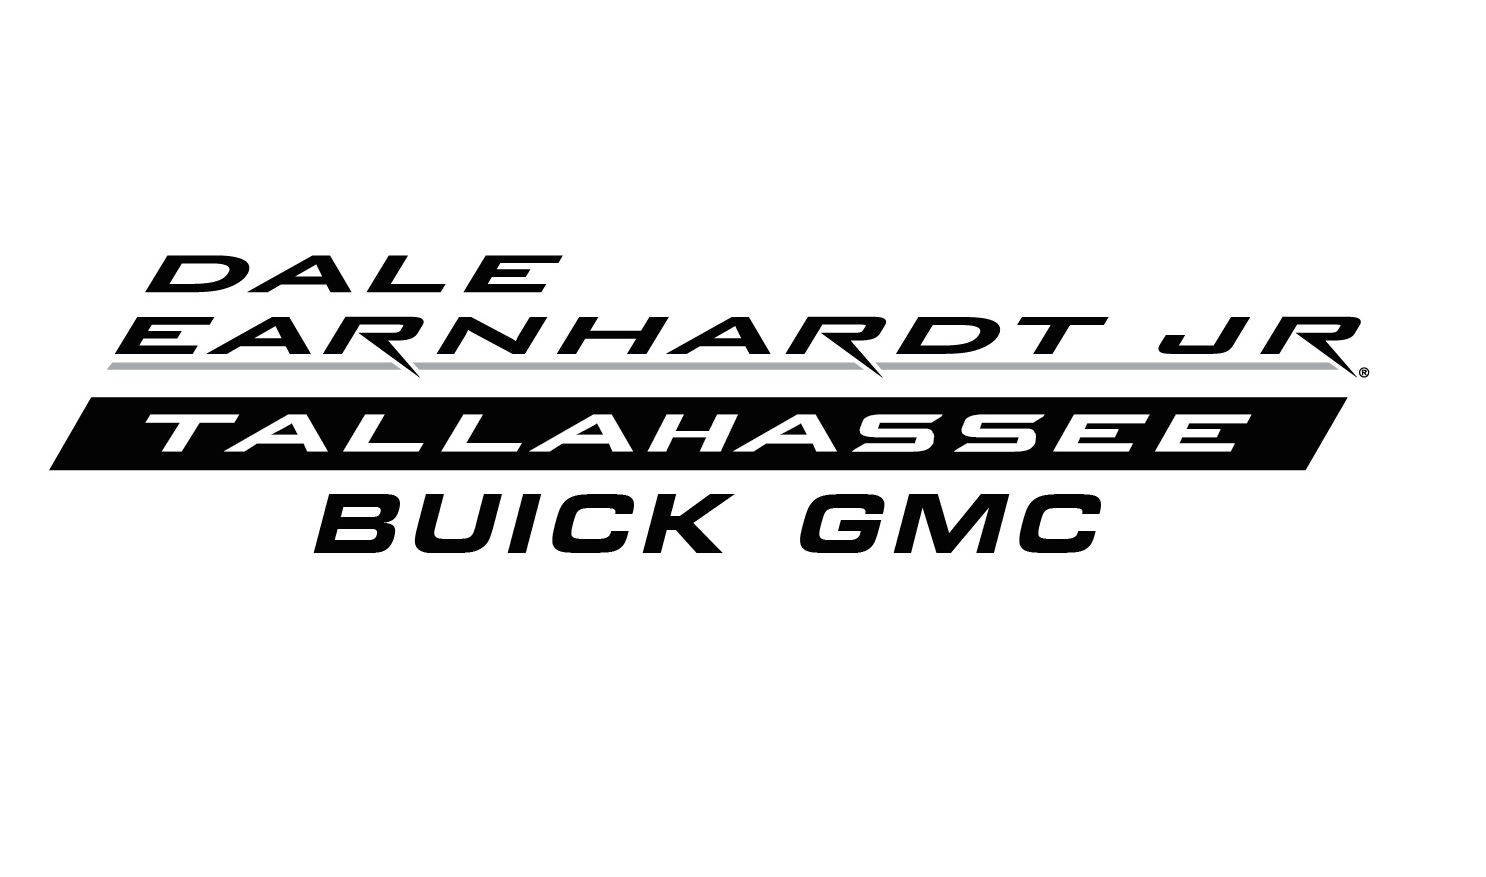 Dale Earnhardt Jr. Buick GMC Cadillac - Tallahassee, FL ...